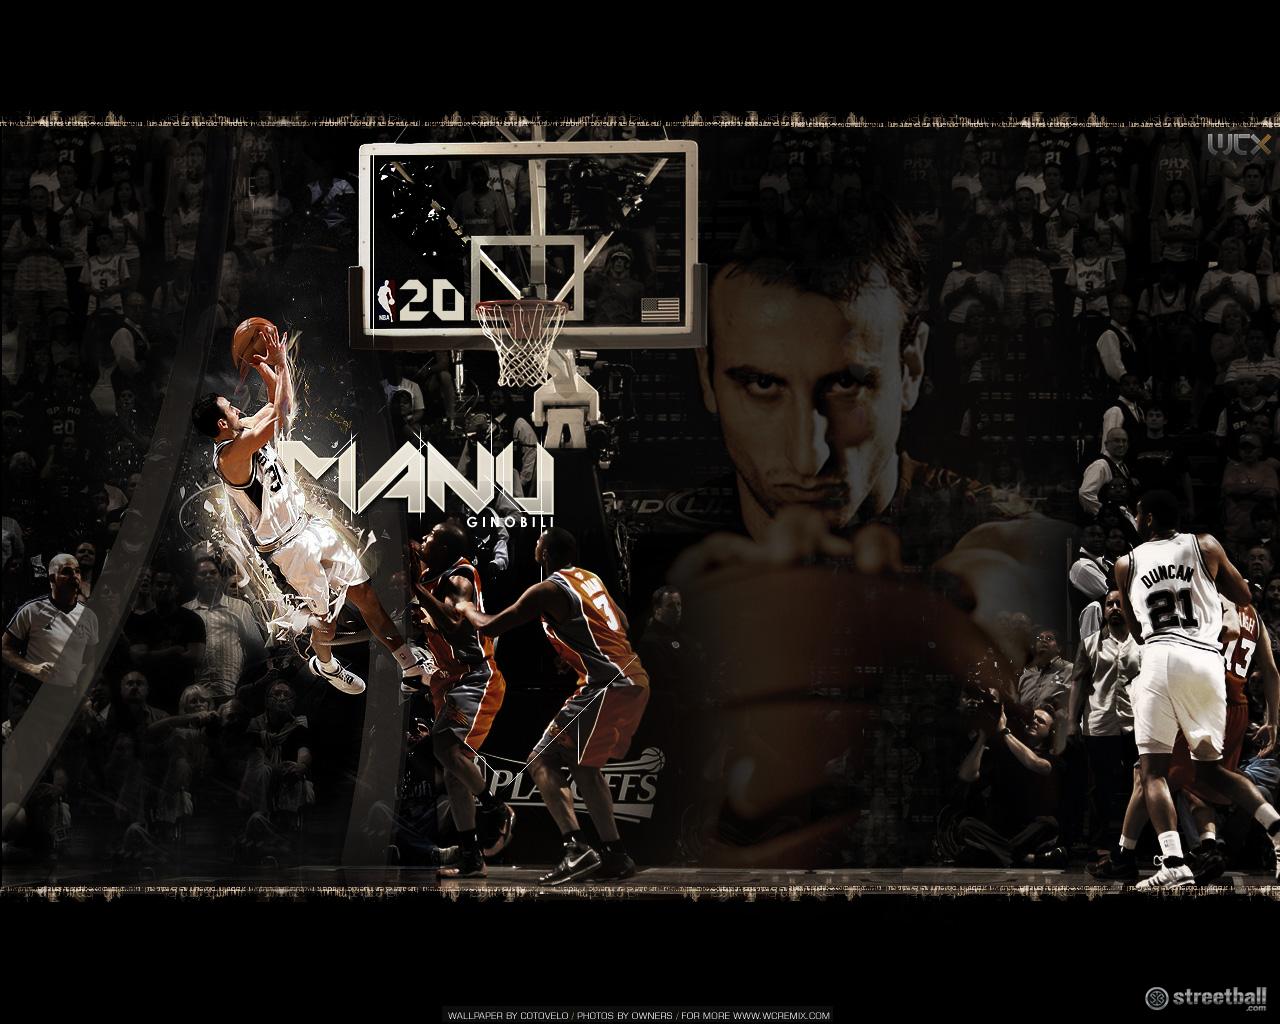 San Antonio Spurs HD background San Antonio Spurs wallpapers 1280x1024